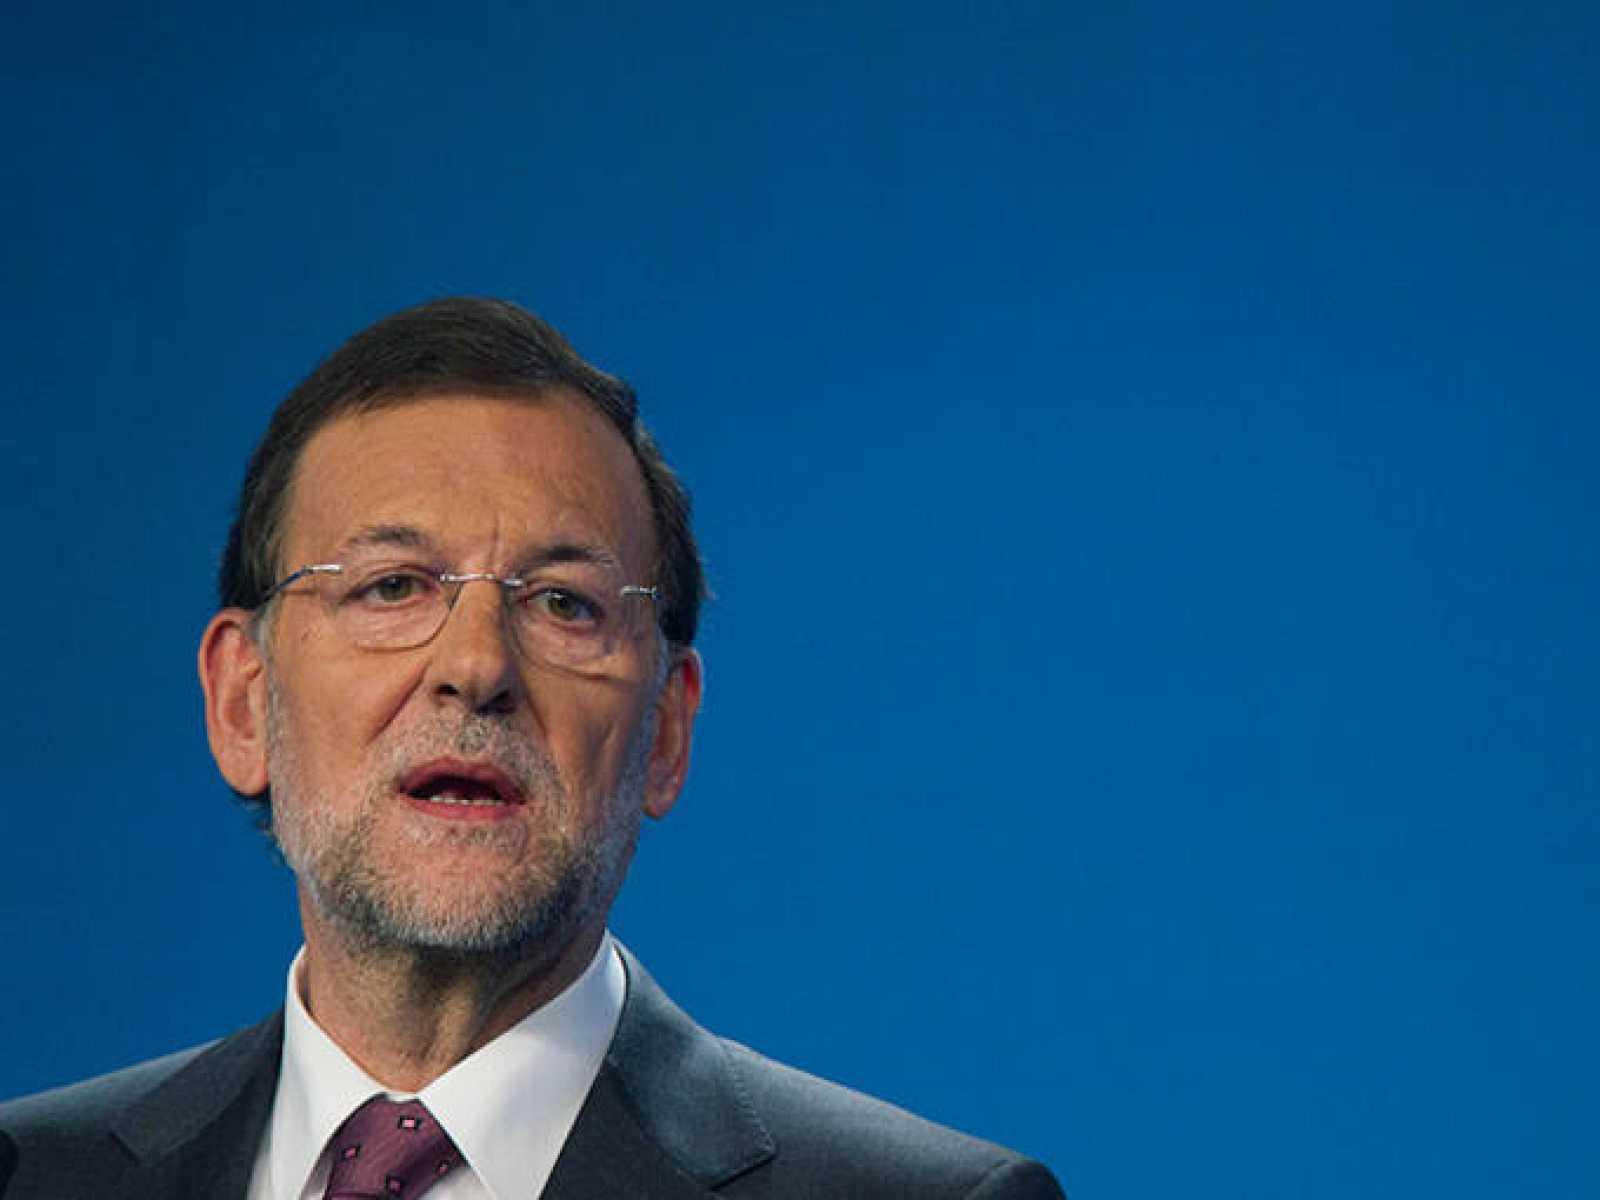 Mariano Rajoy se presenta por tercera vez como candidato a la Moncloa